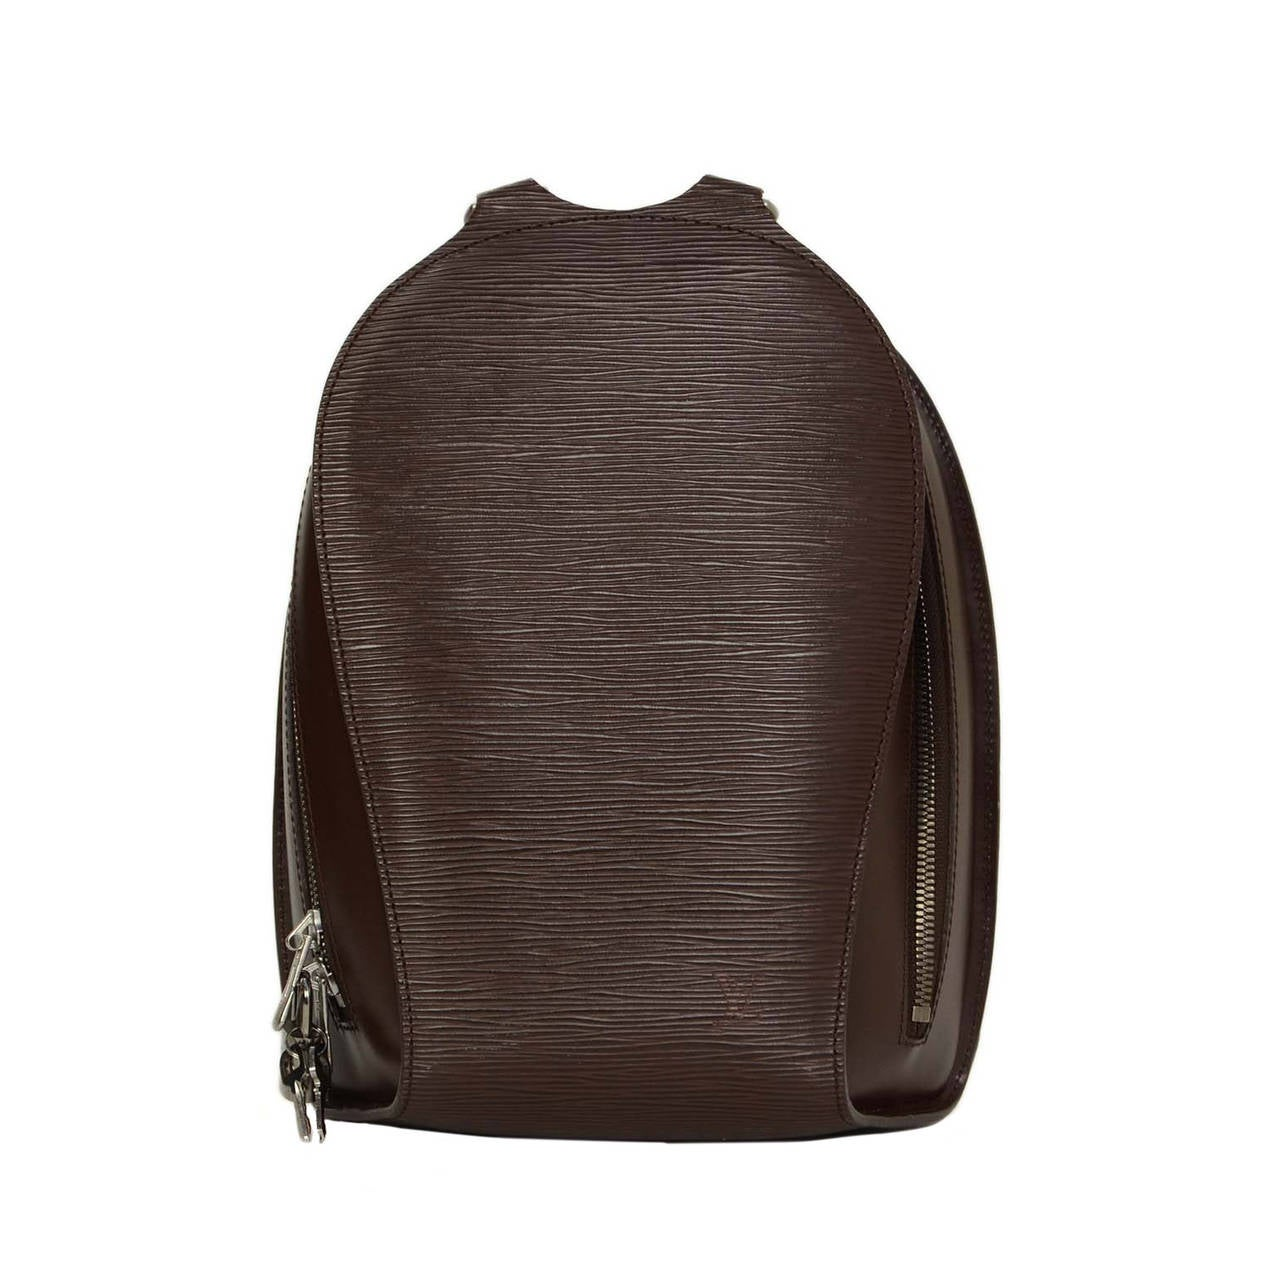 Sac A Dos Louis Vuitton Michael : Louis vuitton mocha epi quot sac a dos backpack shw